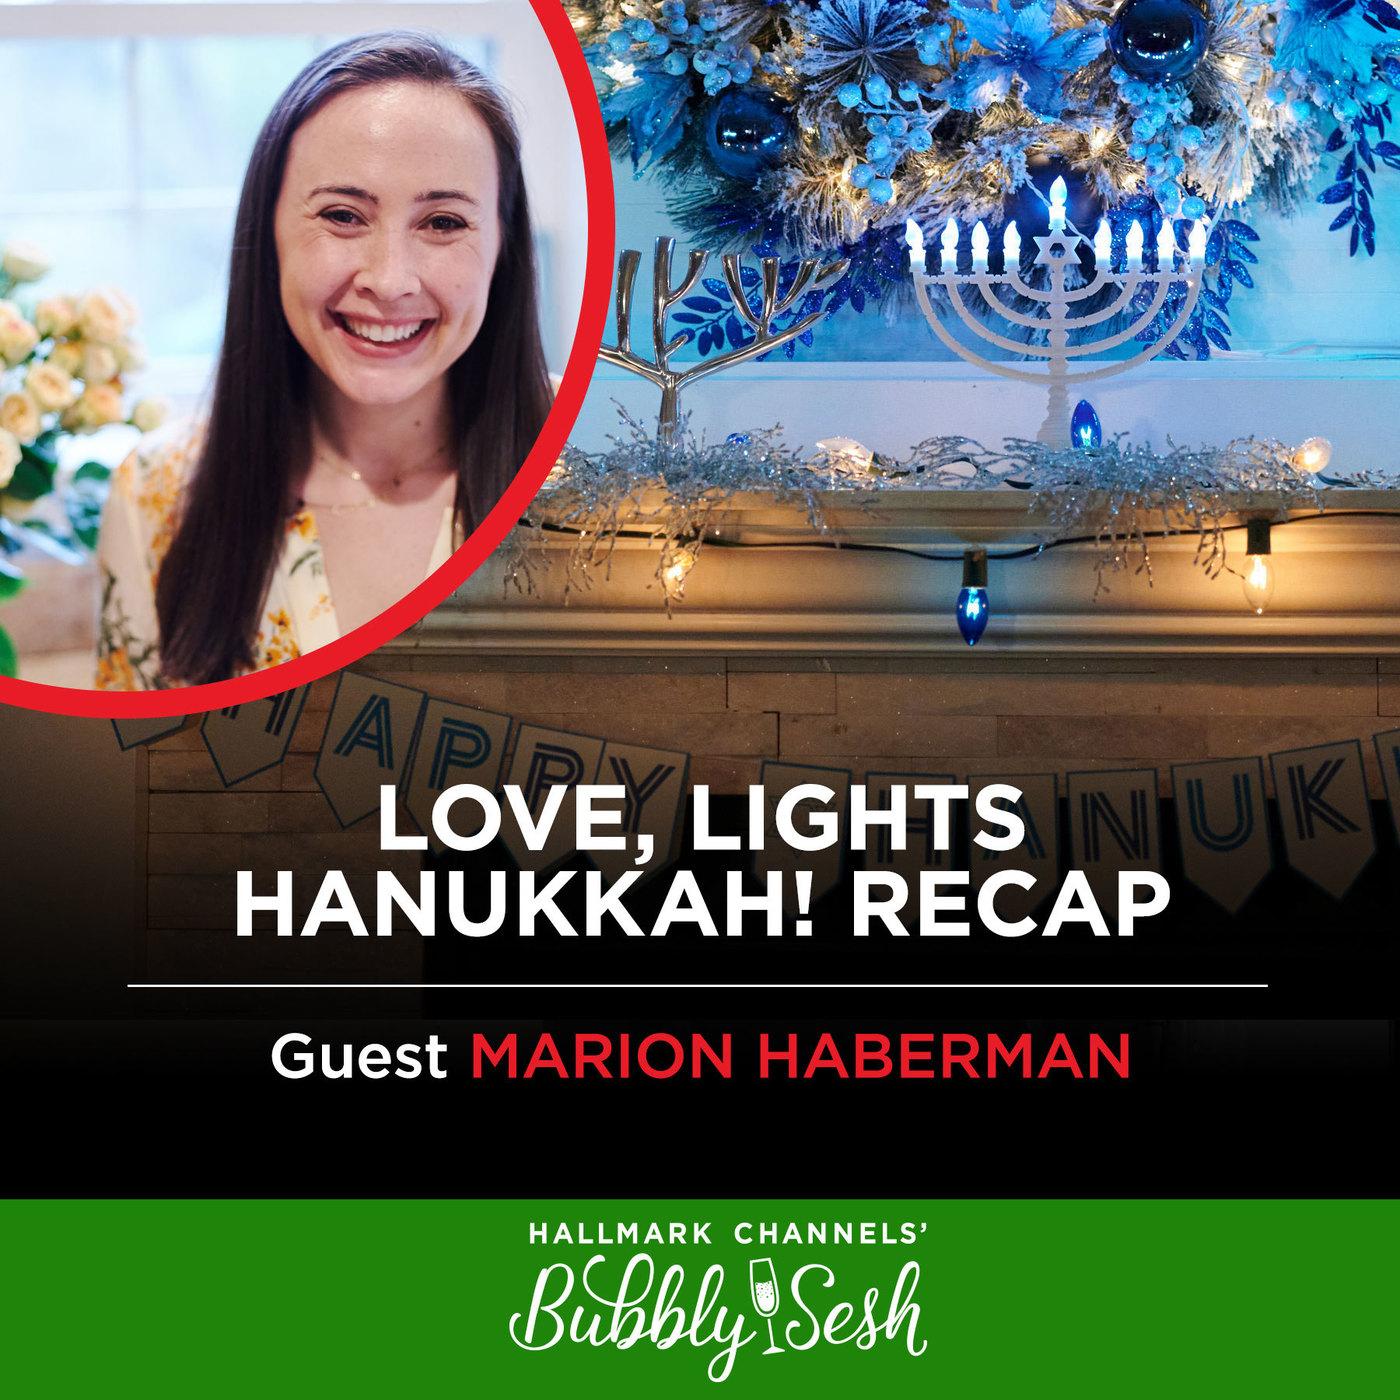 Love, Lights, Hanukkah! Recap with Marion Haberman